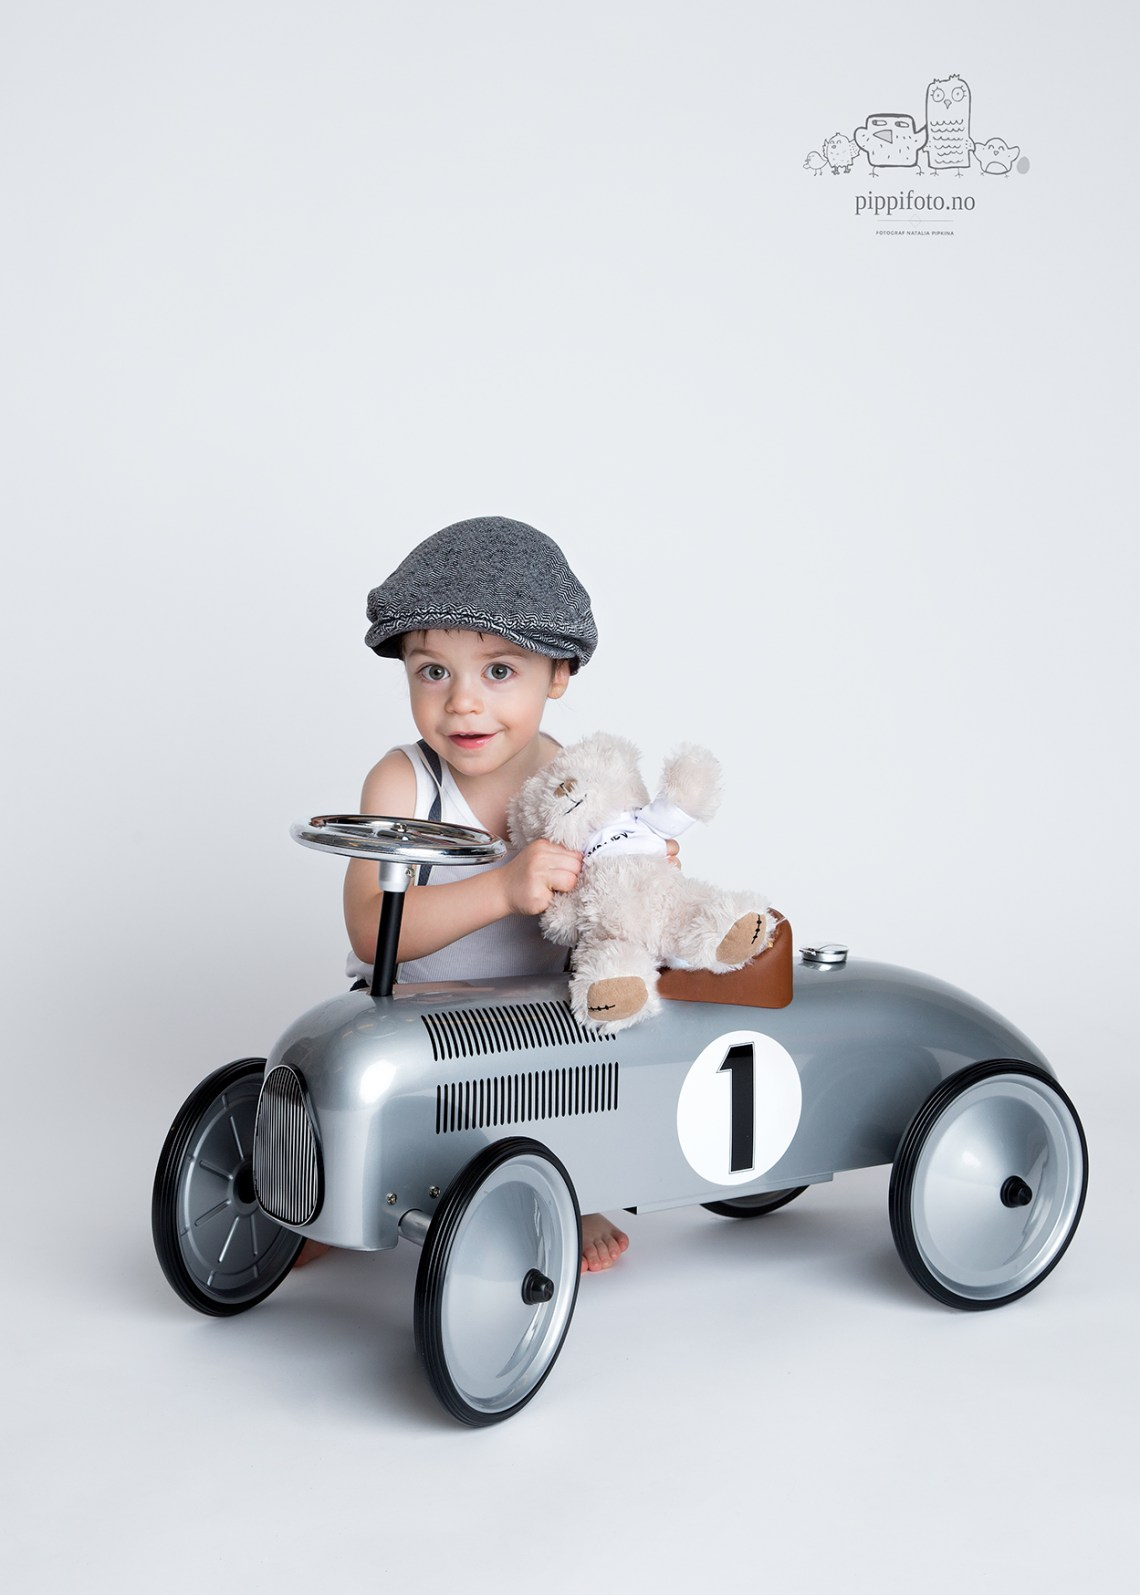 barnefotografering-i-fotostudio-fotograf-oppegård-familiefotografering